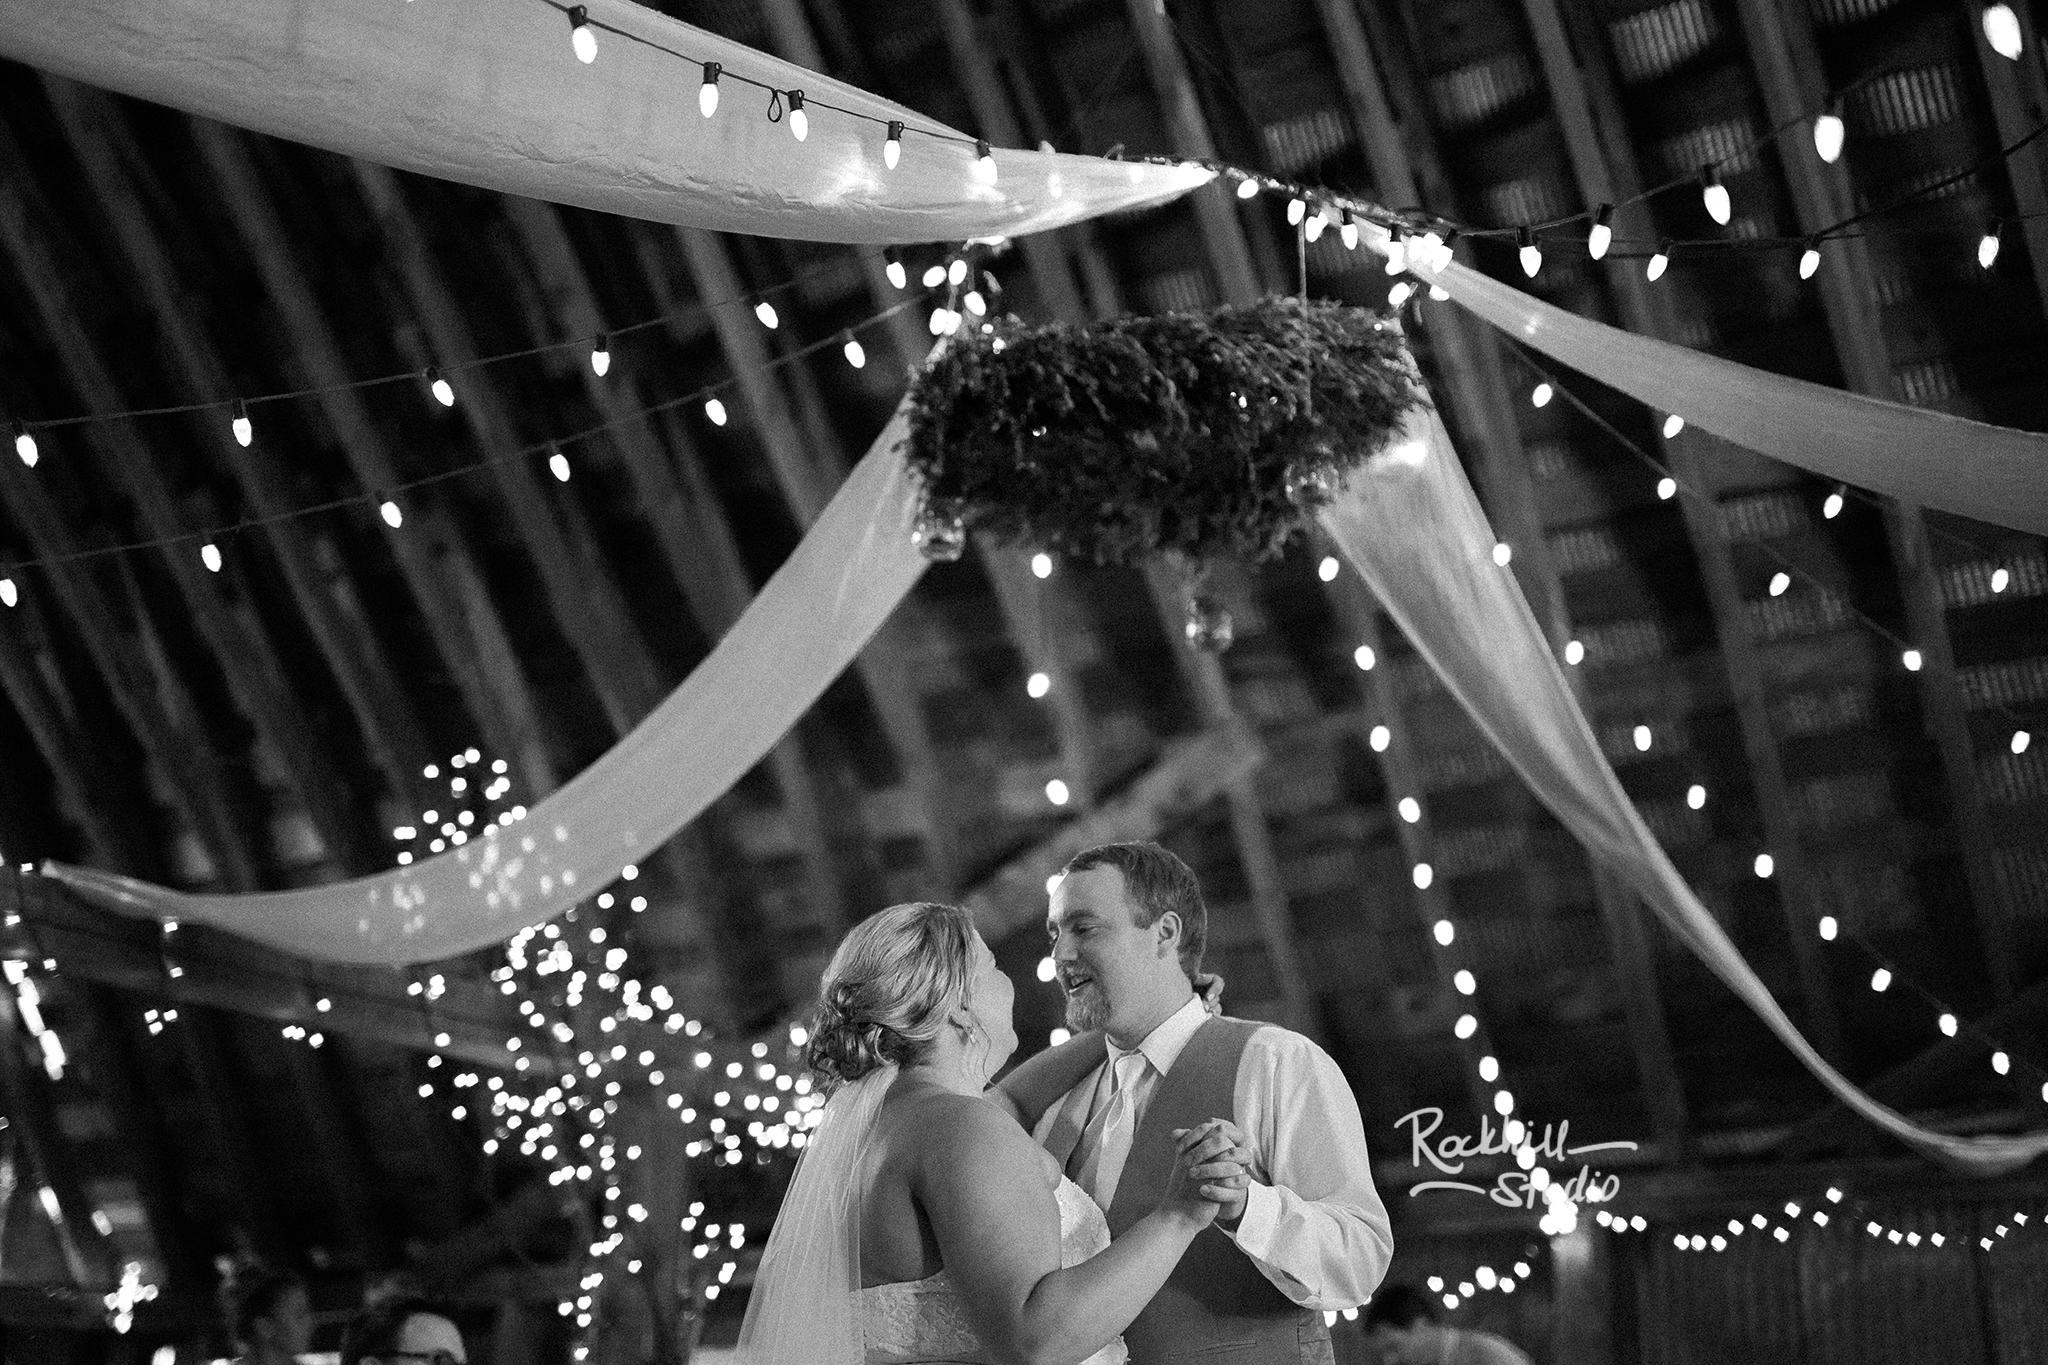 traverse city wedding photographer barn wedding reception